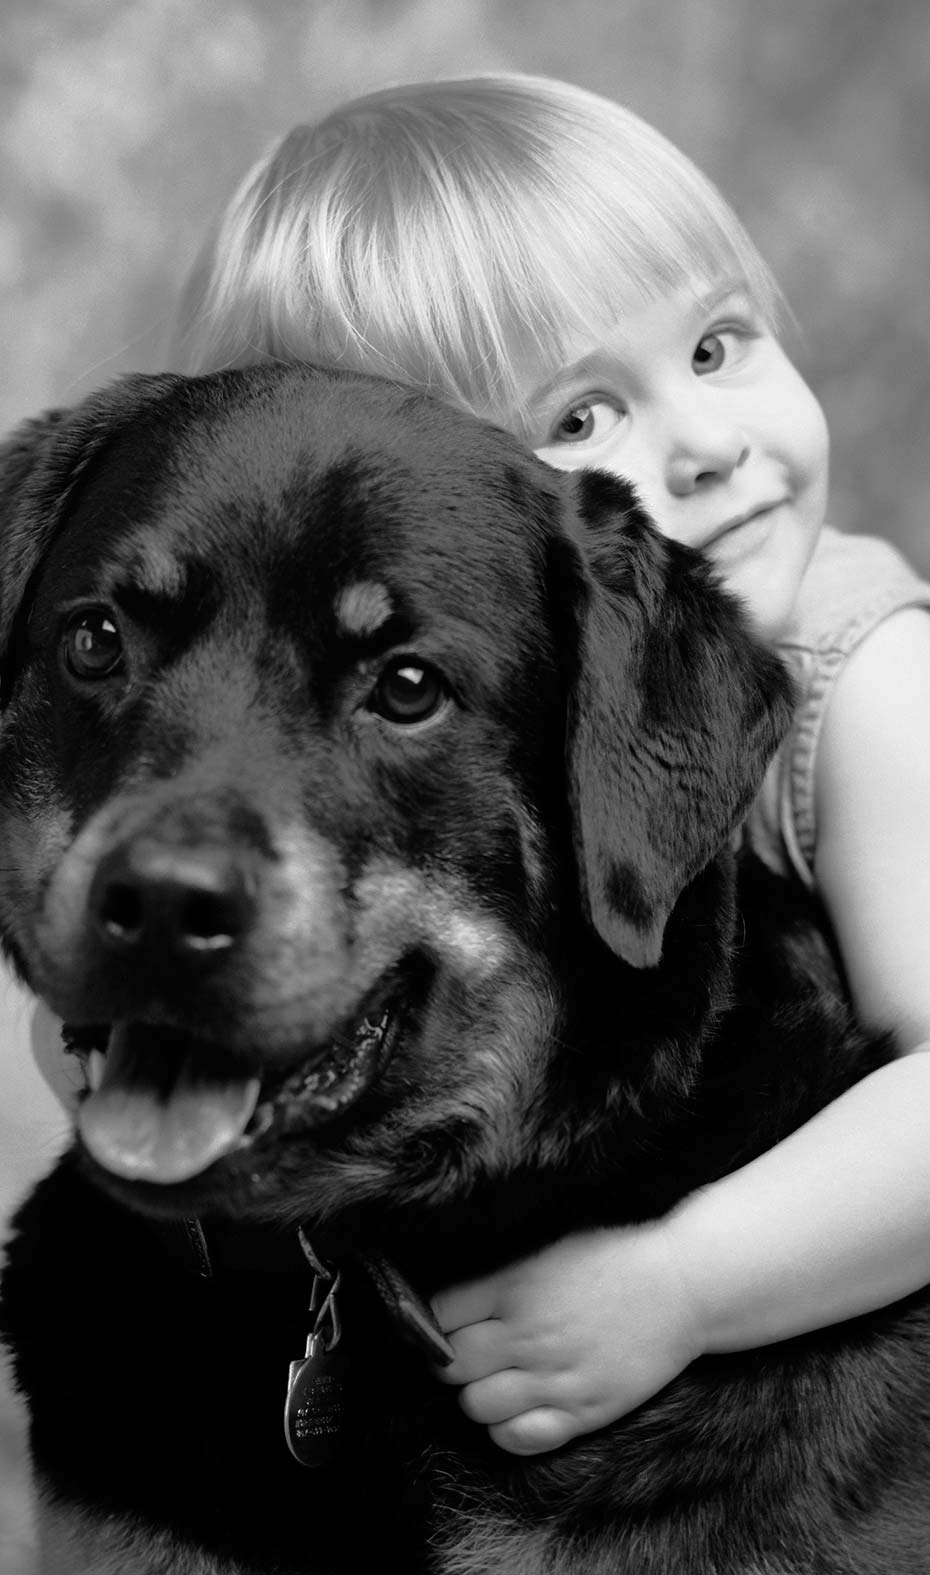 کودک و حیوان خانگی